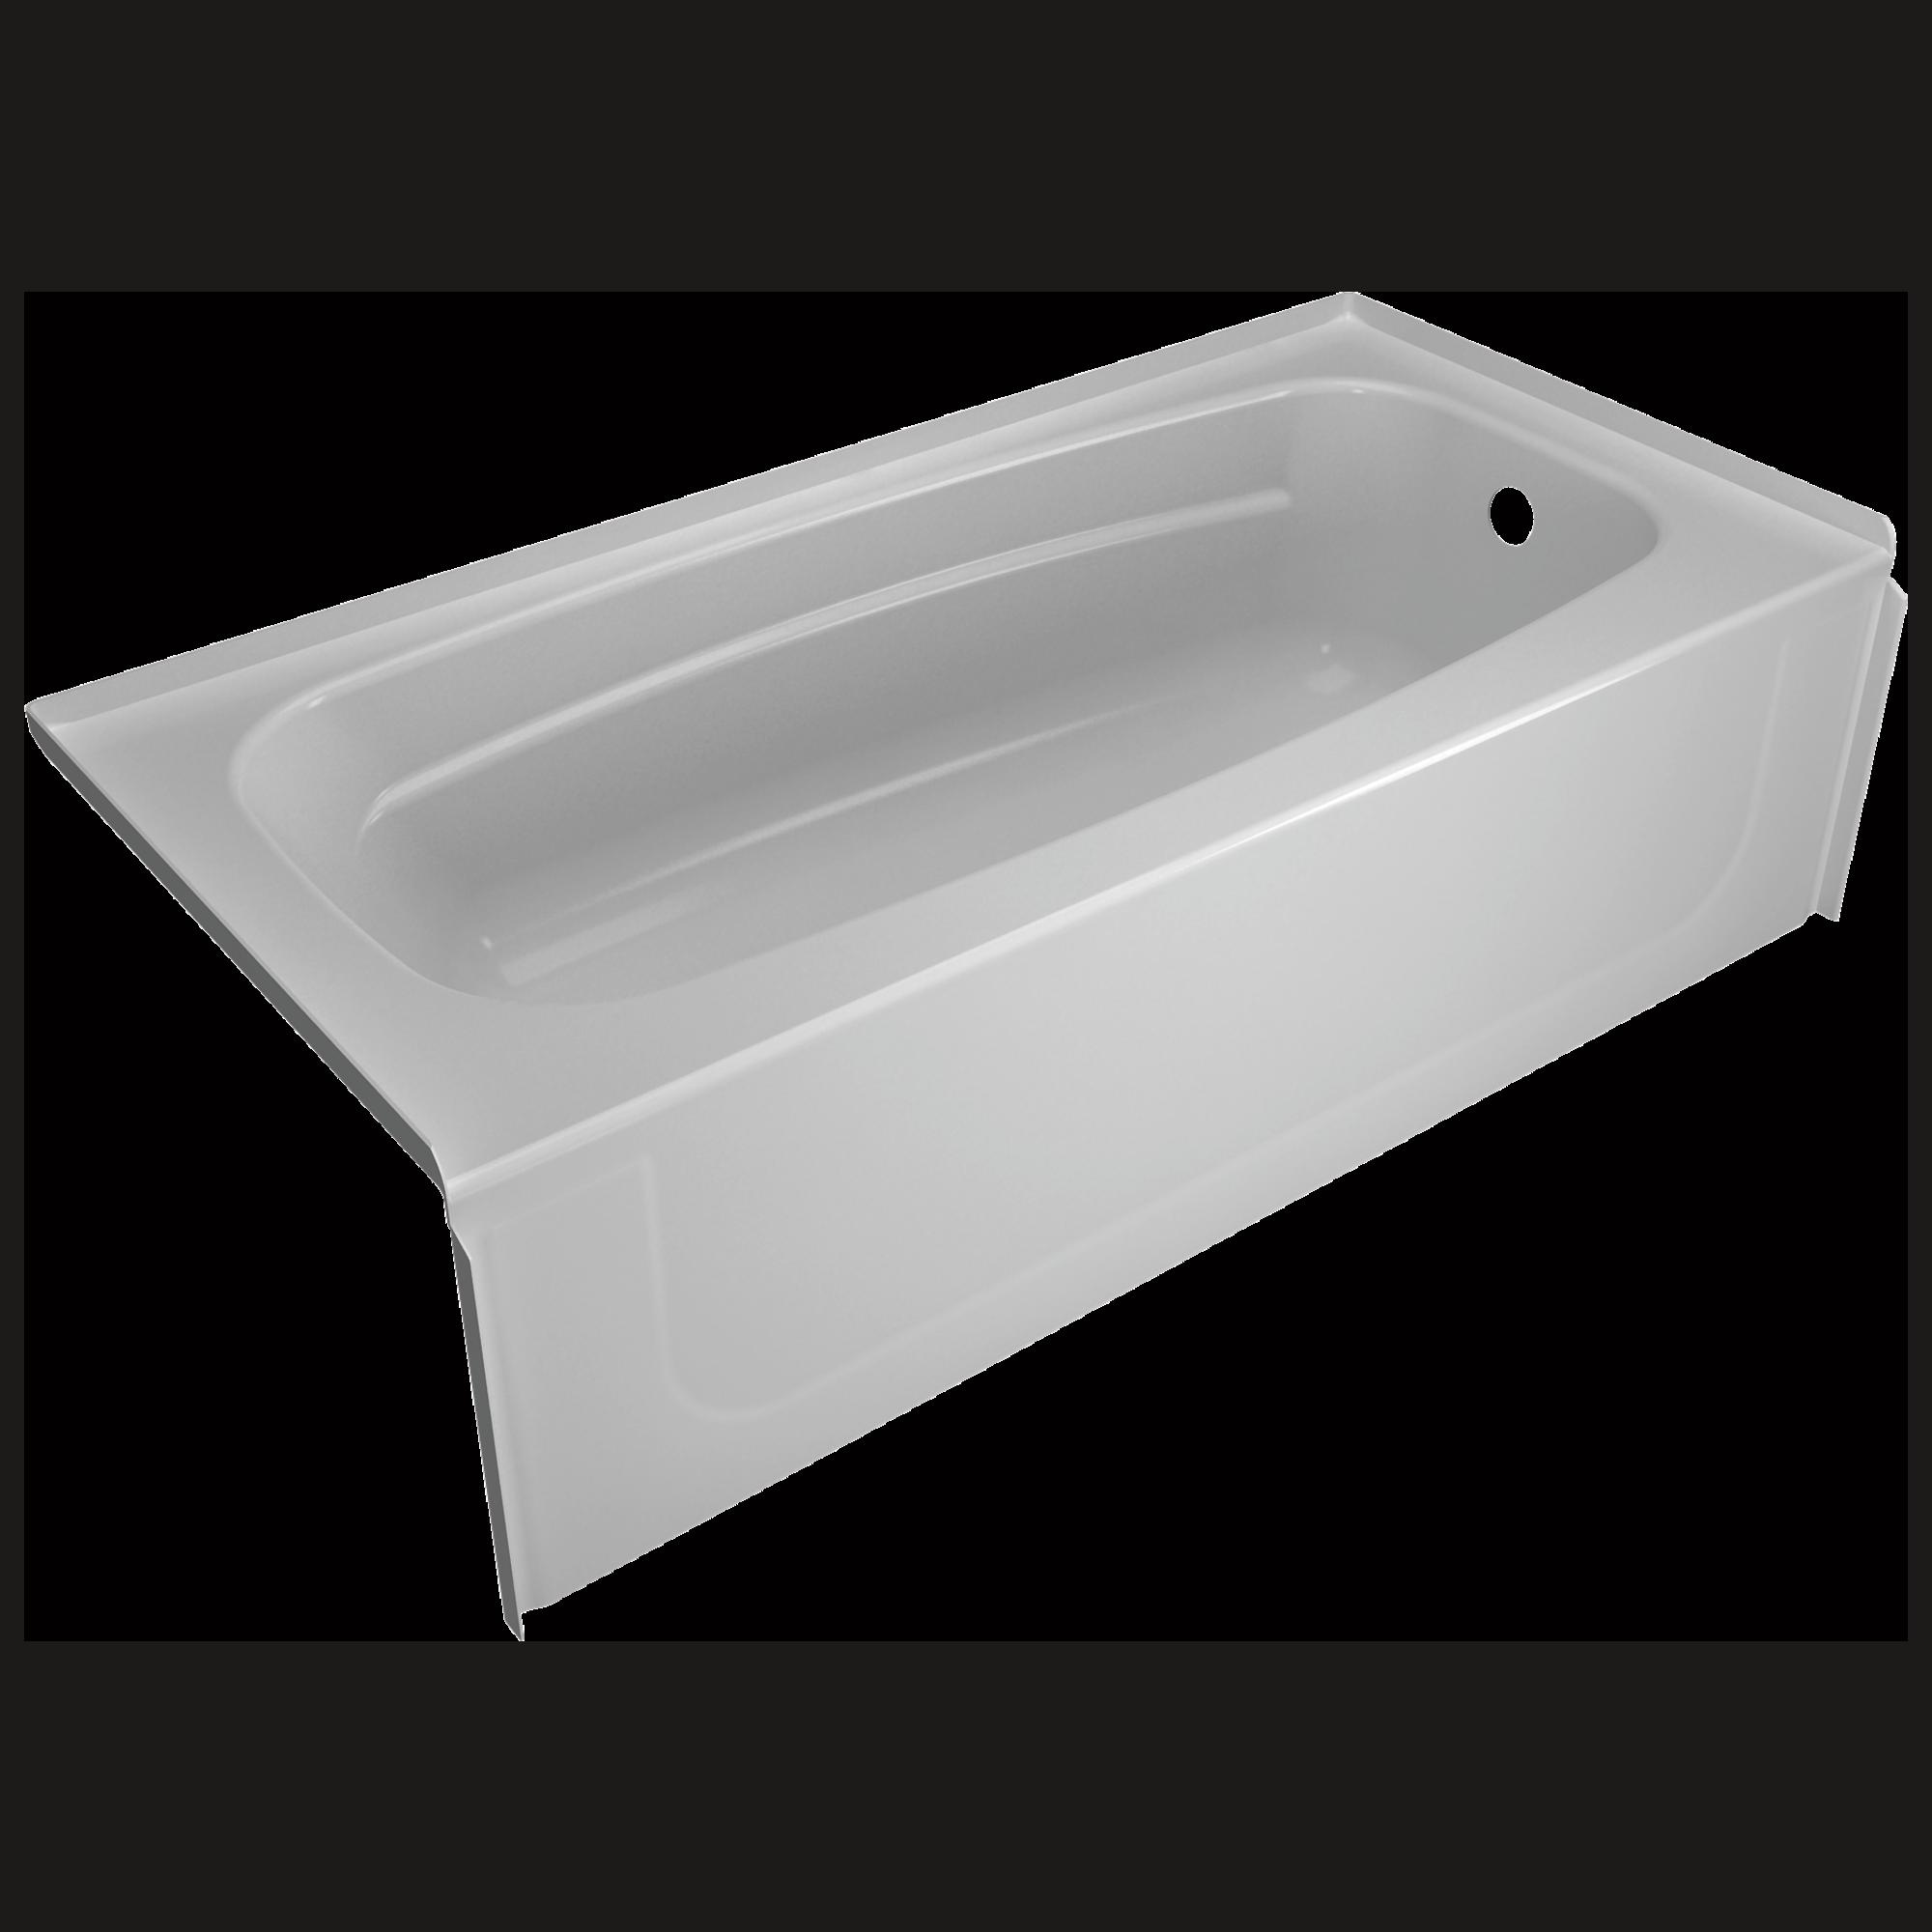 everclean x tub tubs with whirlpools american bathroom apron bathtub standard whirlpool inch bathtubs massage